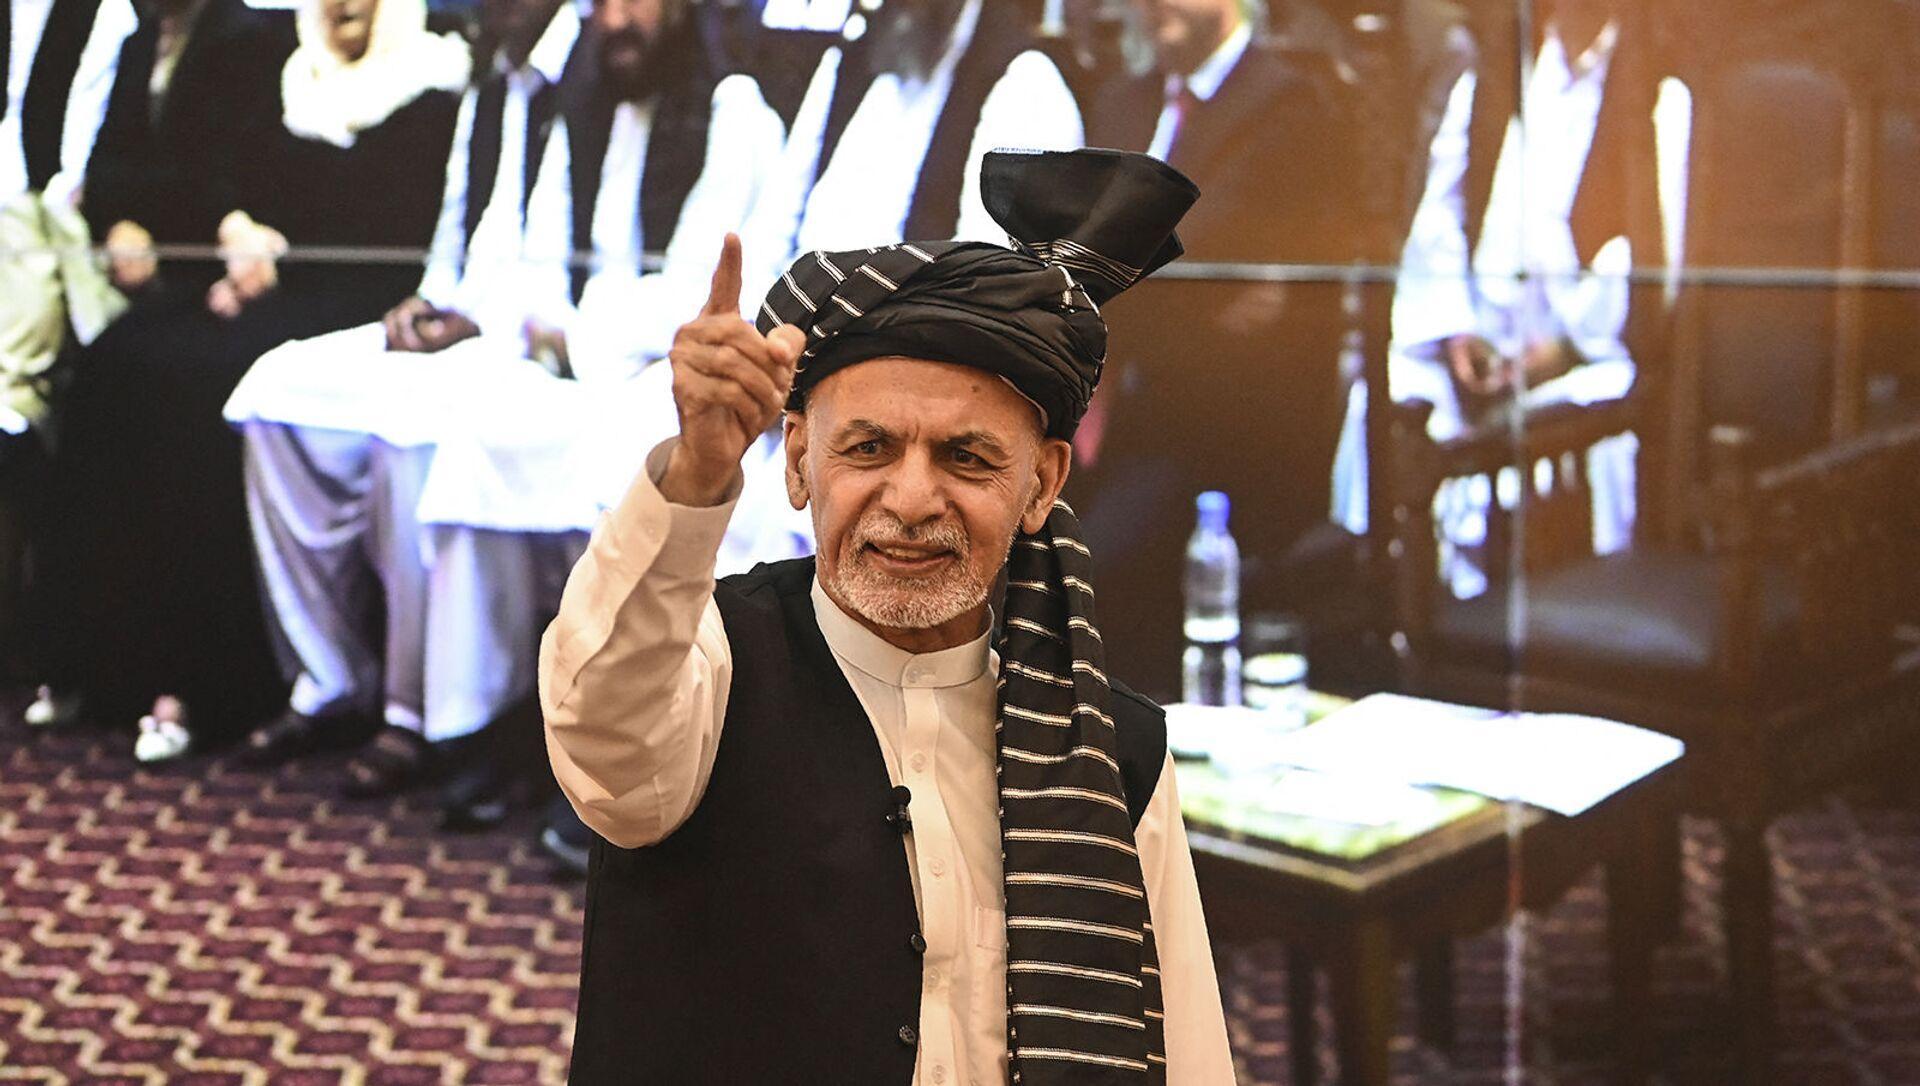 Президент Афганистана Ашраф Гани во время речи в президентском дворце (4 августа 2021). Кабул - Sputnik Արմենիա, 1920, 15.08.2021